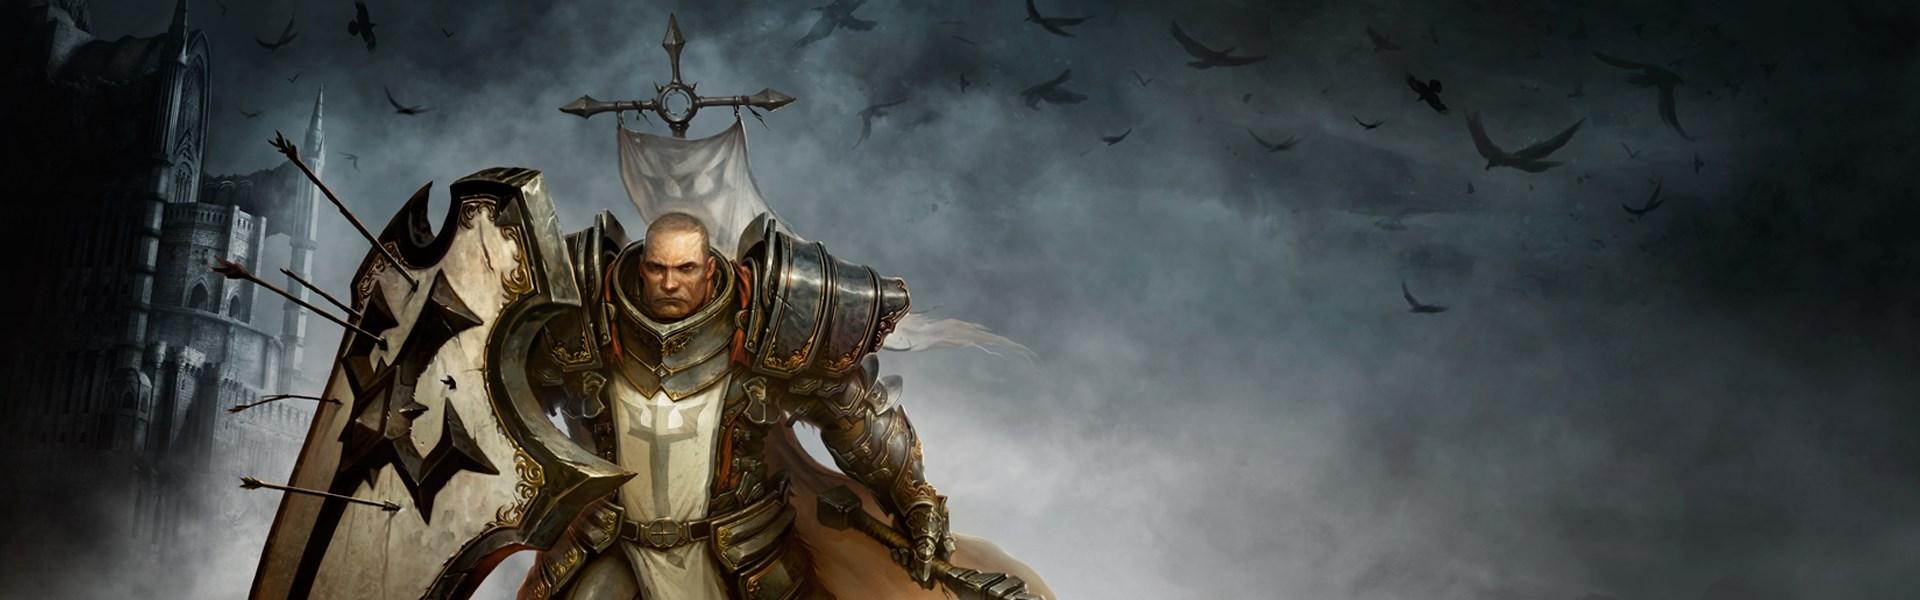 Diablo 3: Reaper of Souls - Infernal Pauldrons (DLC) (Xbox One) Xbox Live Key EUROPE